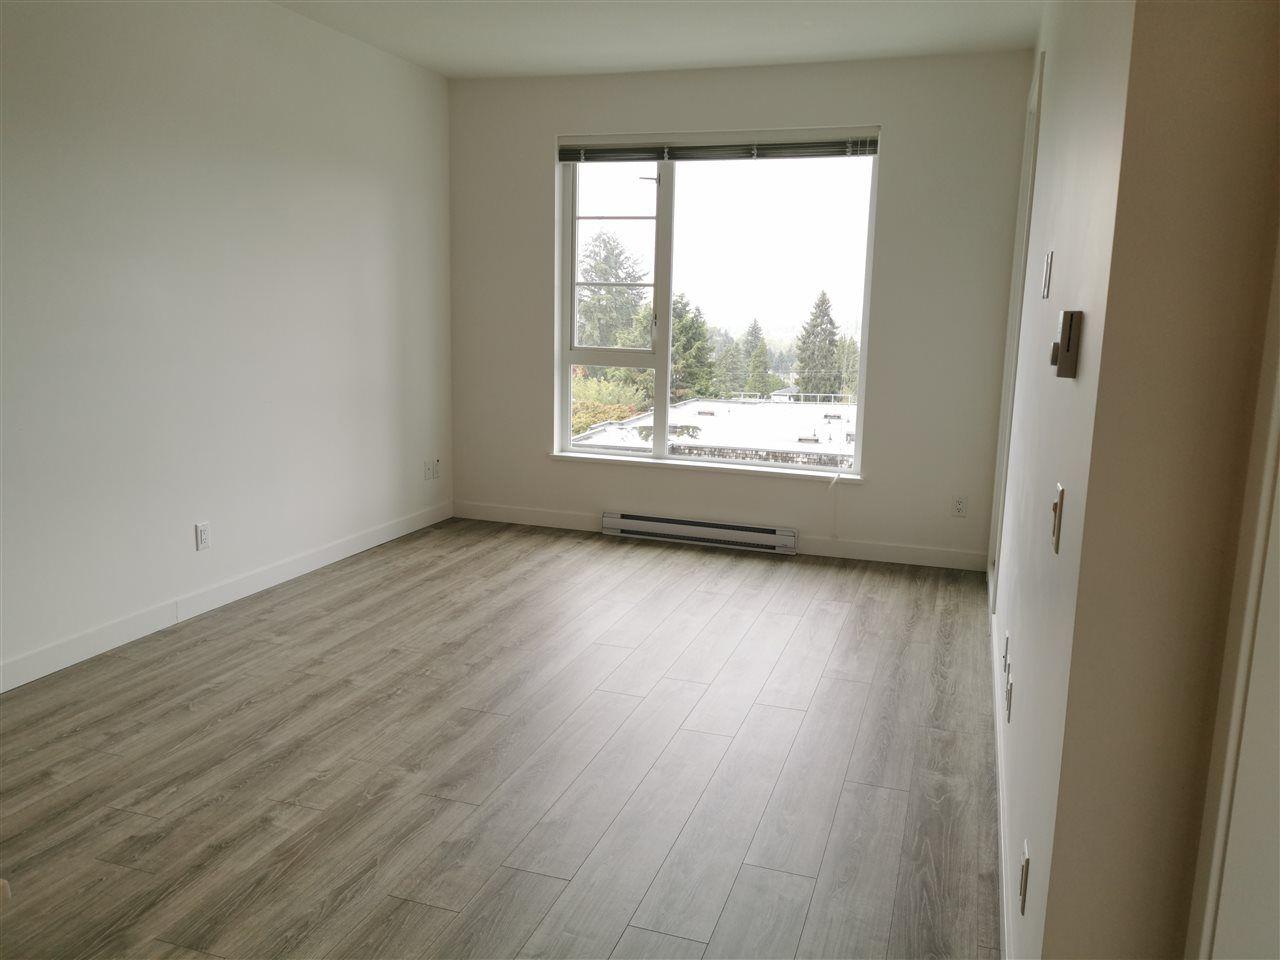 Main Photo: 406 516 FOSTER Avenue in Coquitlam: Coquitlam West Condo for sale : MLS®# R2548490